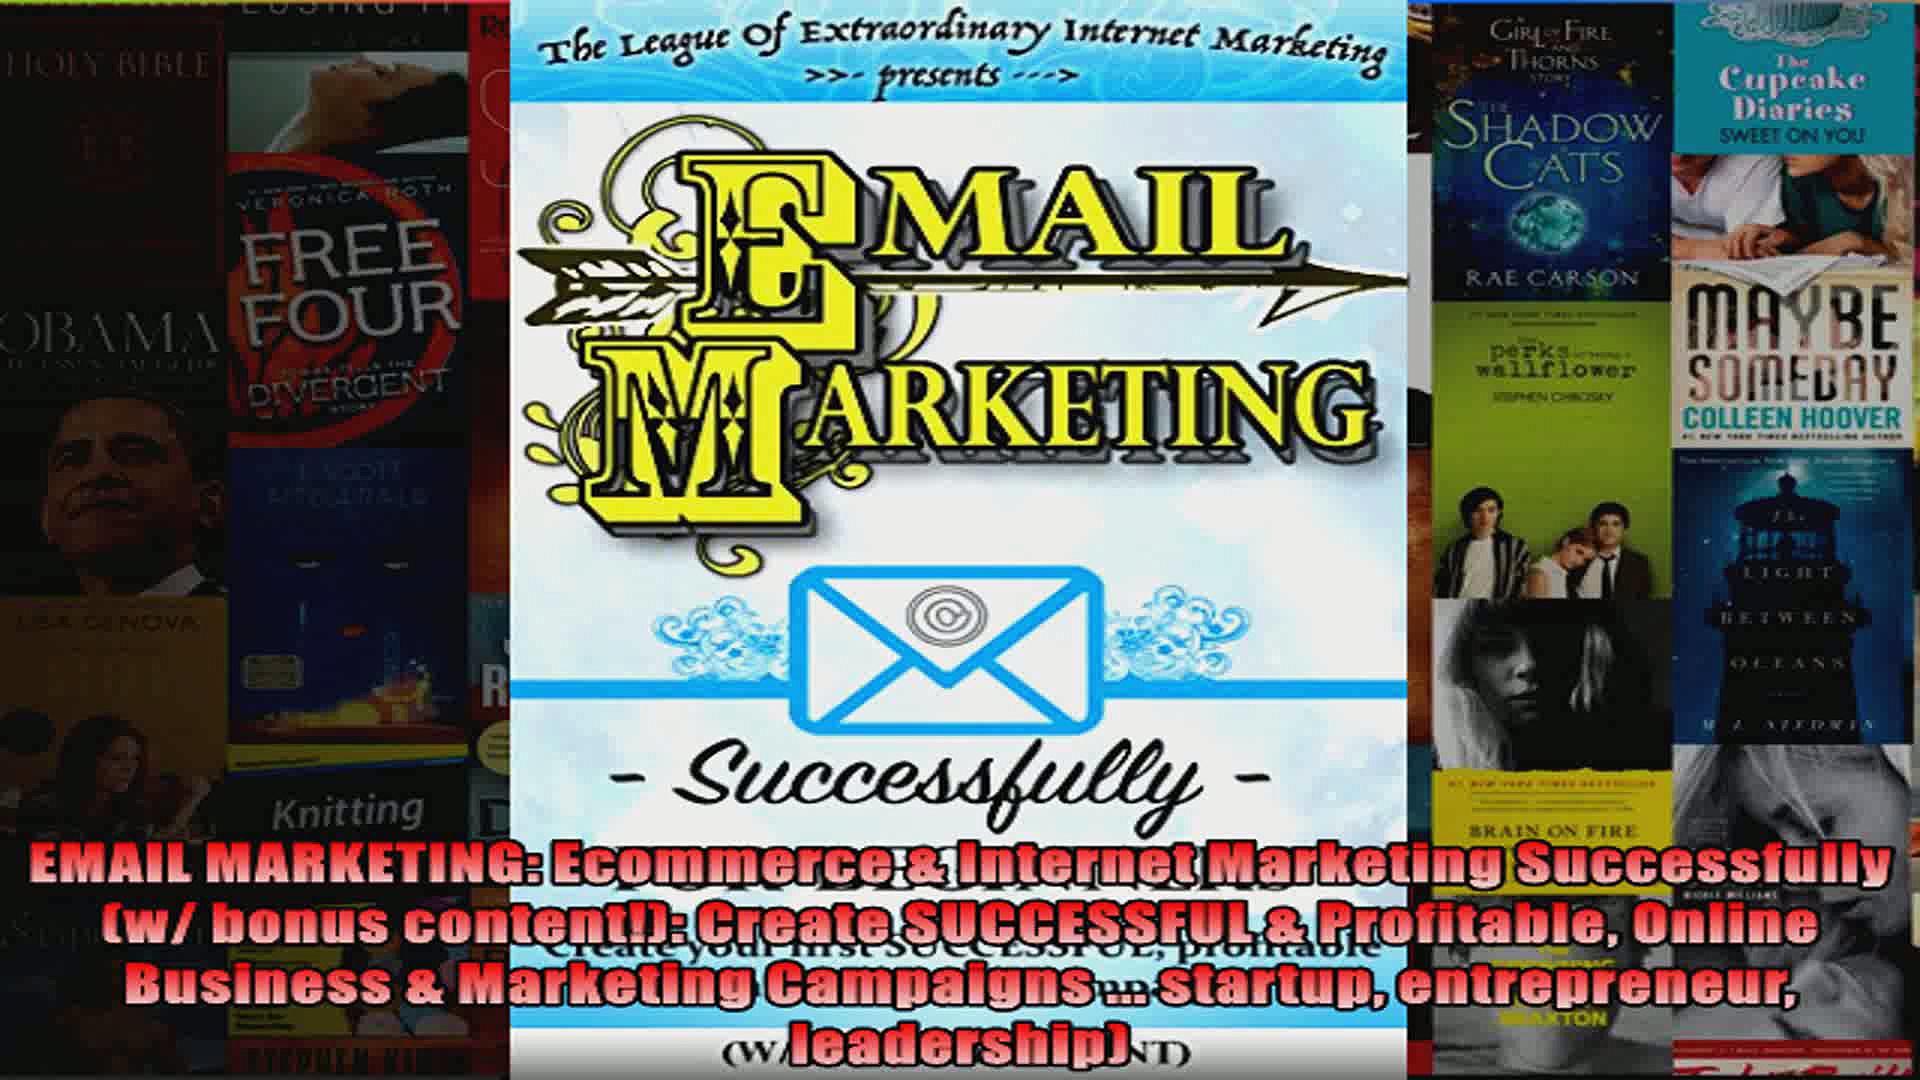 EMAIL MARKETING Ecommerce  Internet Marketing Successfully w bonus content Create